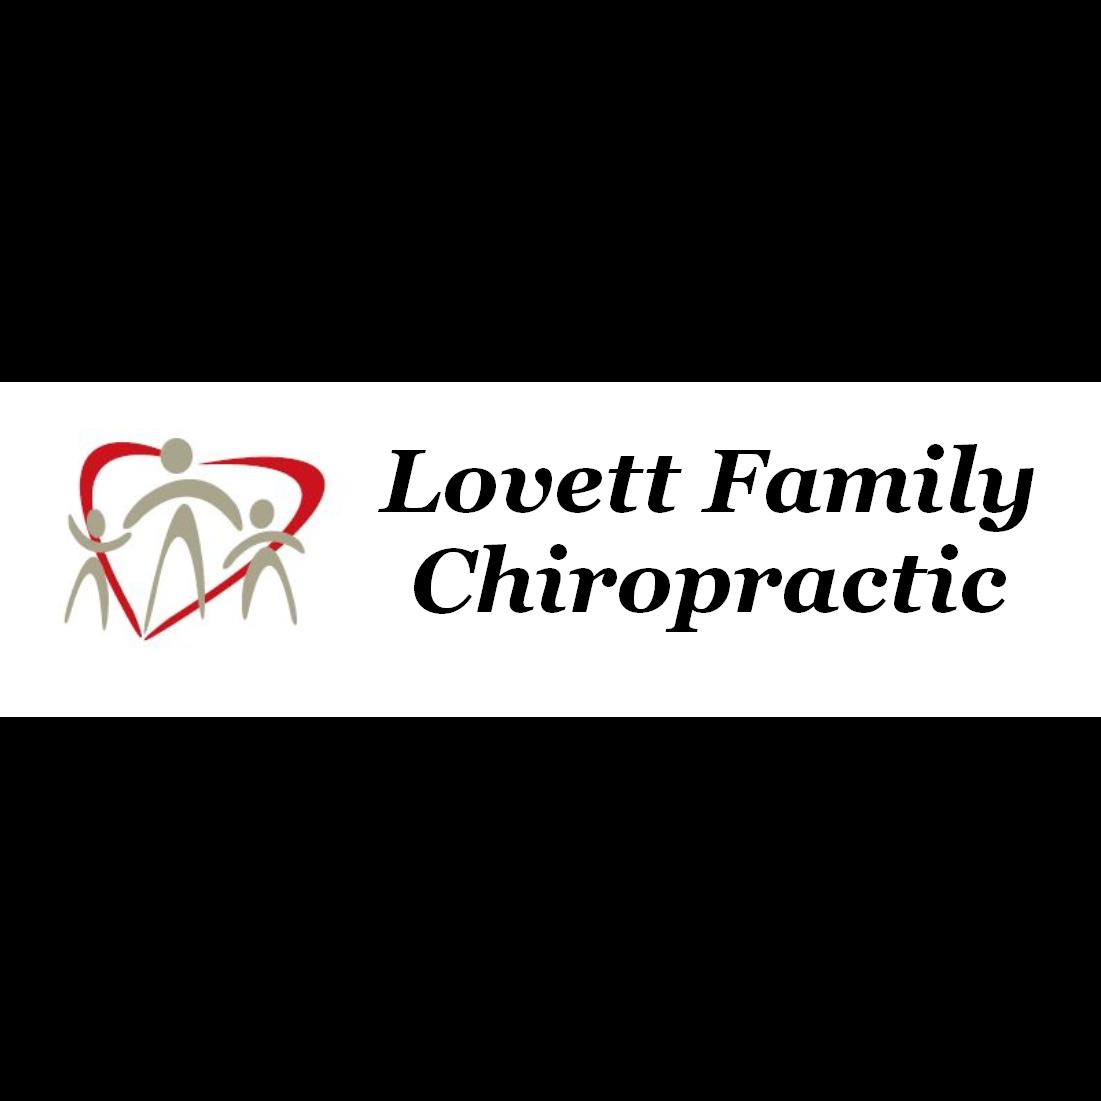 Lovett Family Chiropractic and Wellness Center image 4